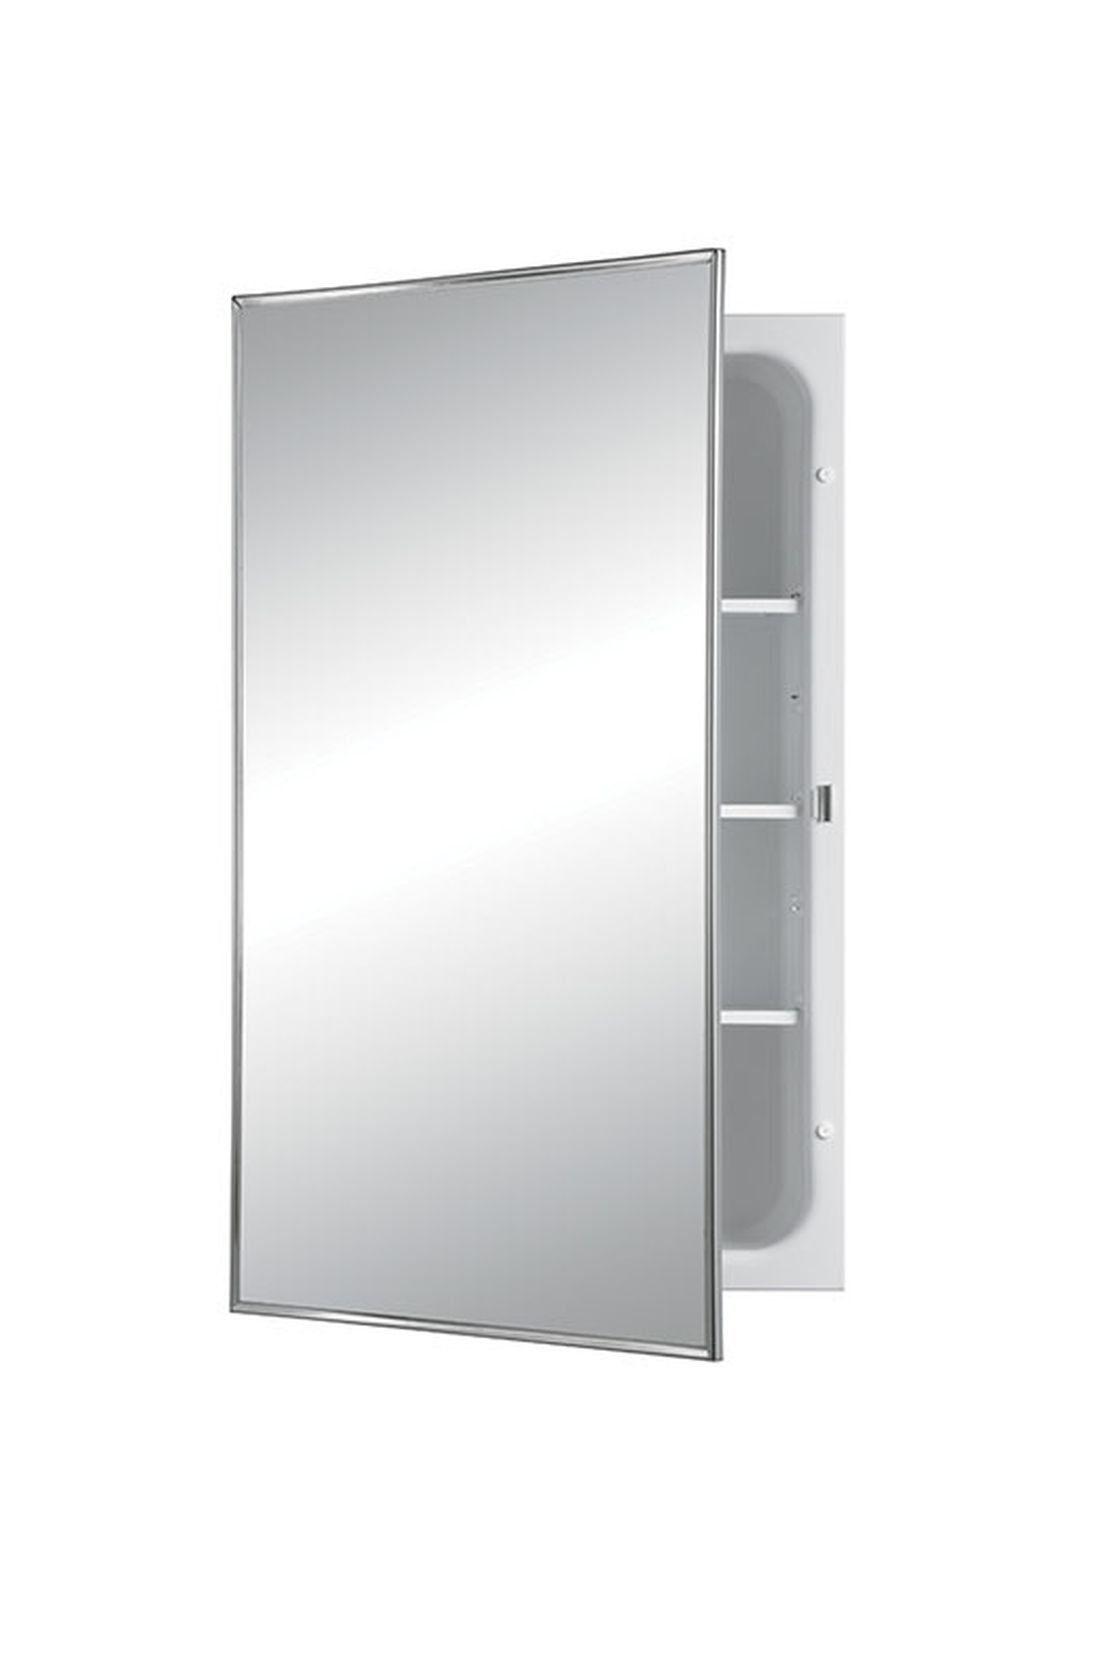 Jensen 468bcx Stainless Medicine Cabinet Frame Medicine Cabinet Steel Shelf Stainless Steel Frame